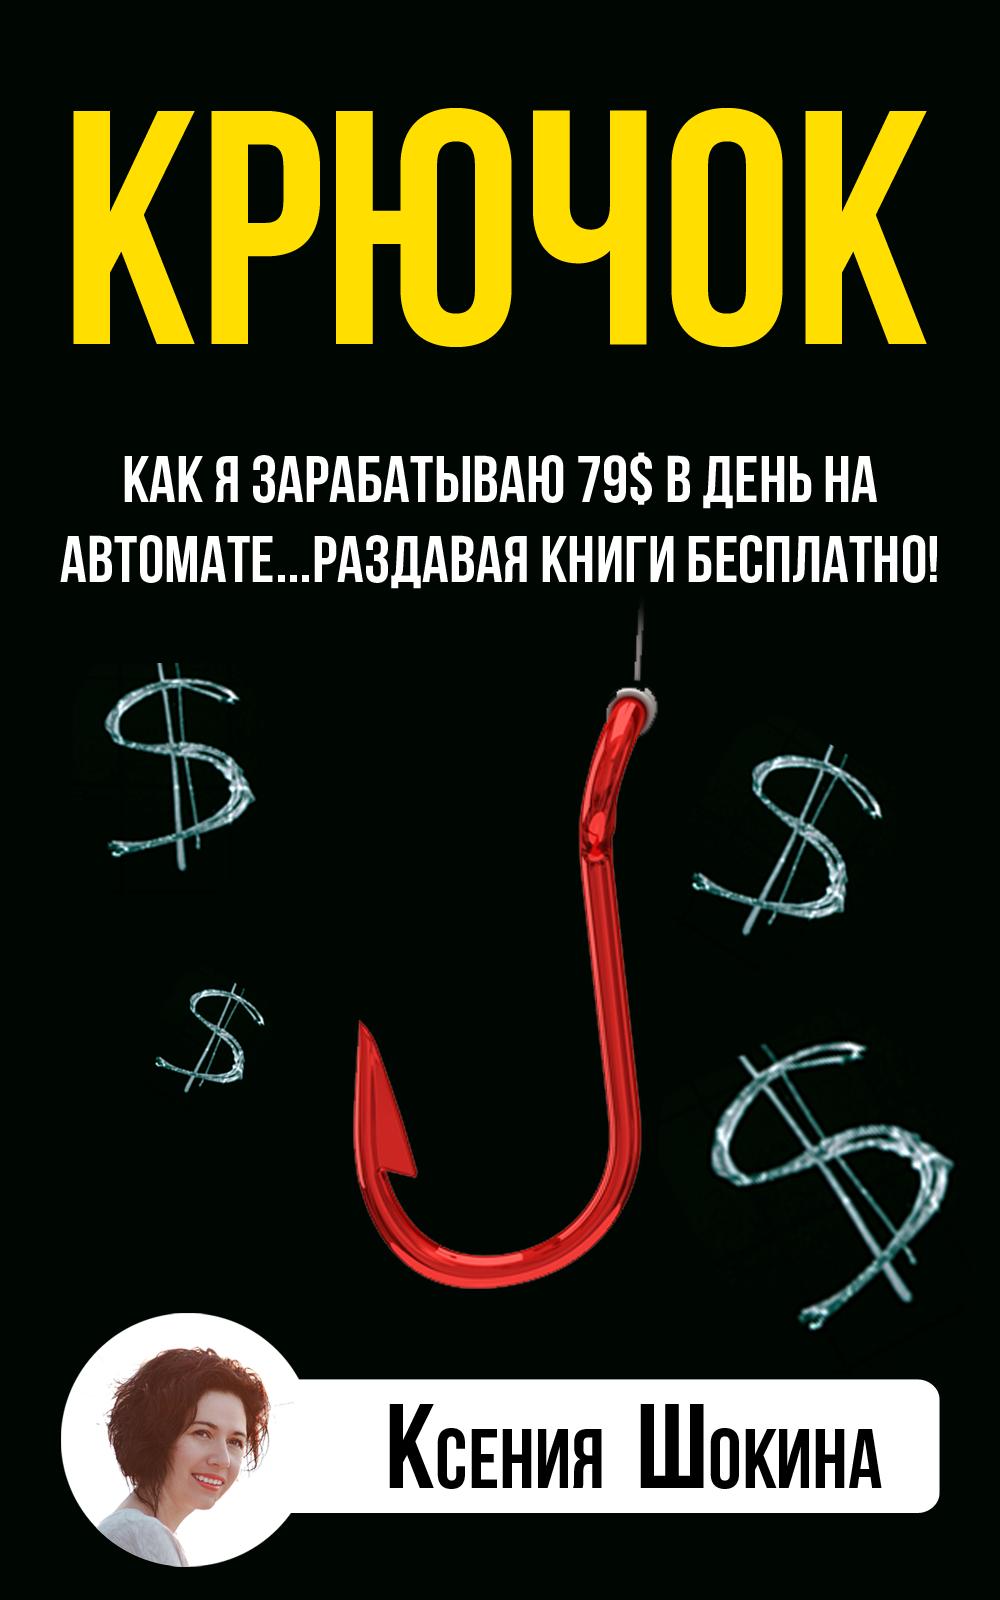 https://glopart.ru/uploads/images/71261/25d2b549f64f490f8d864c3b796a22eb.png